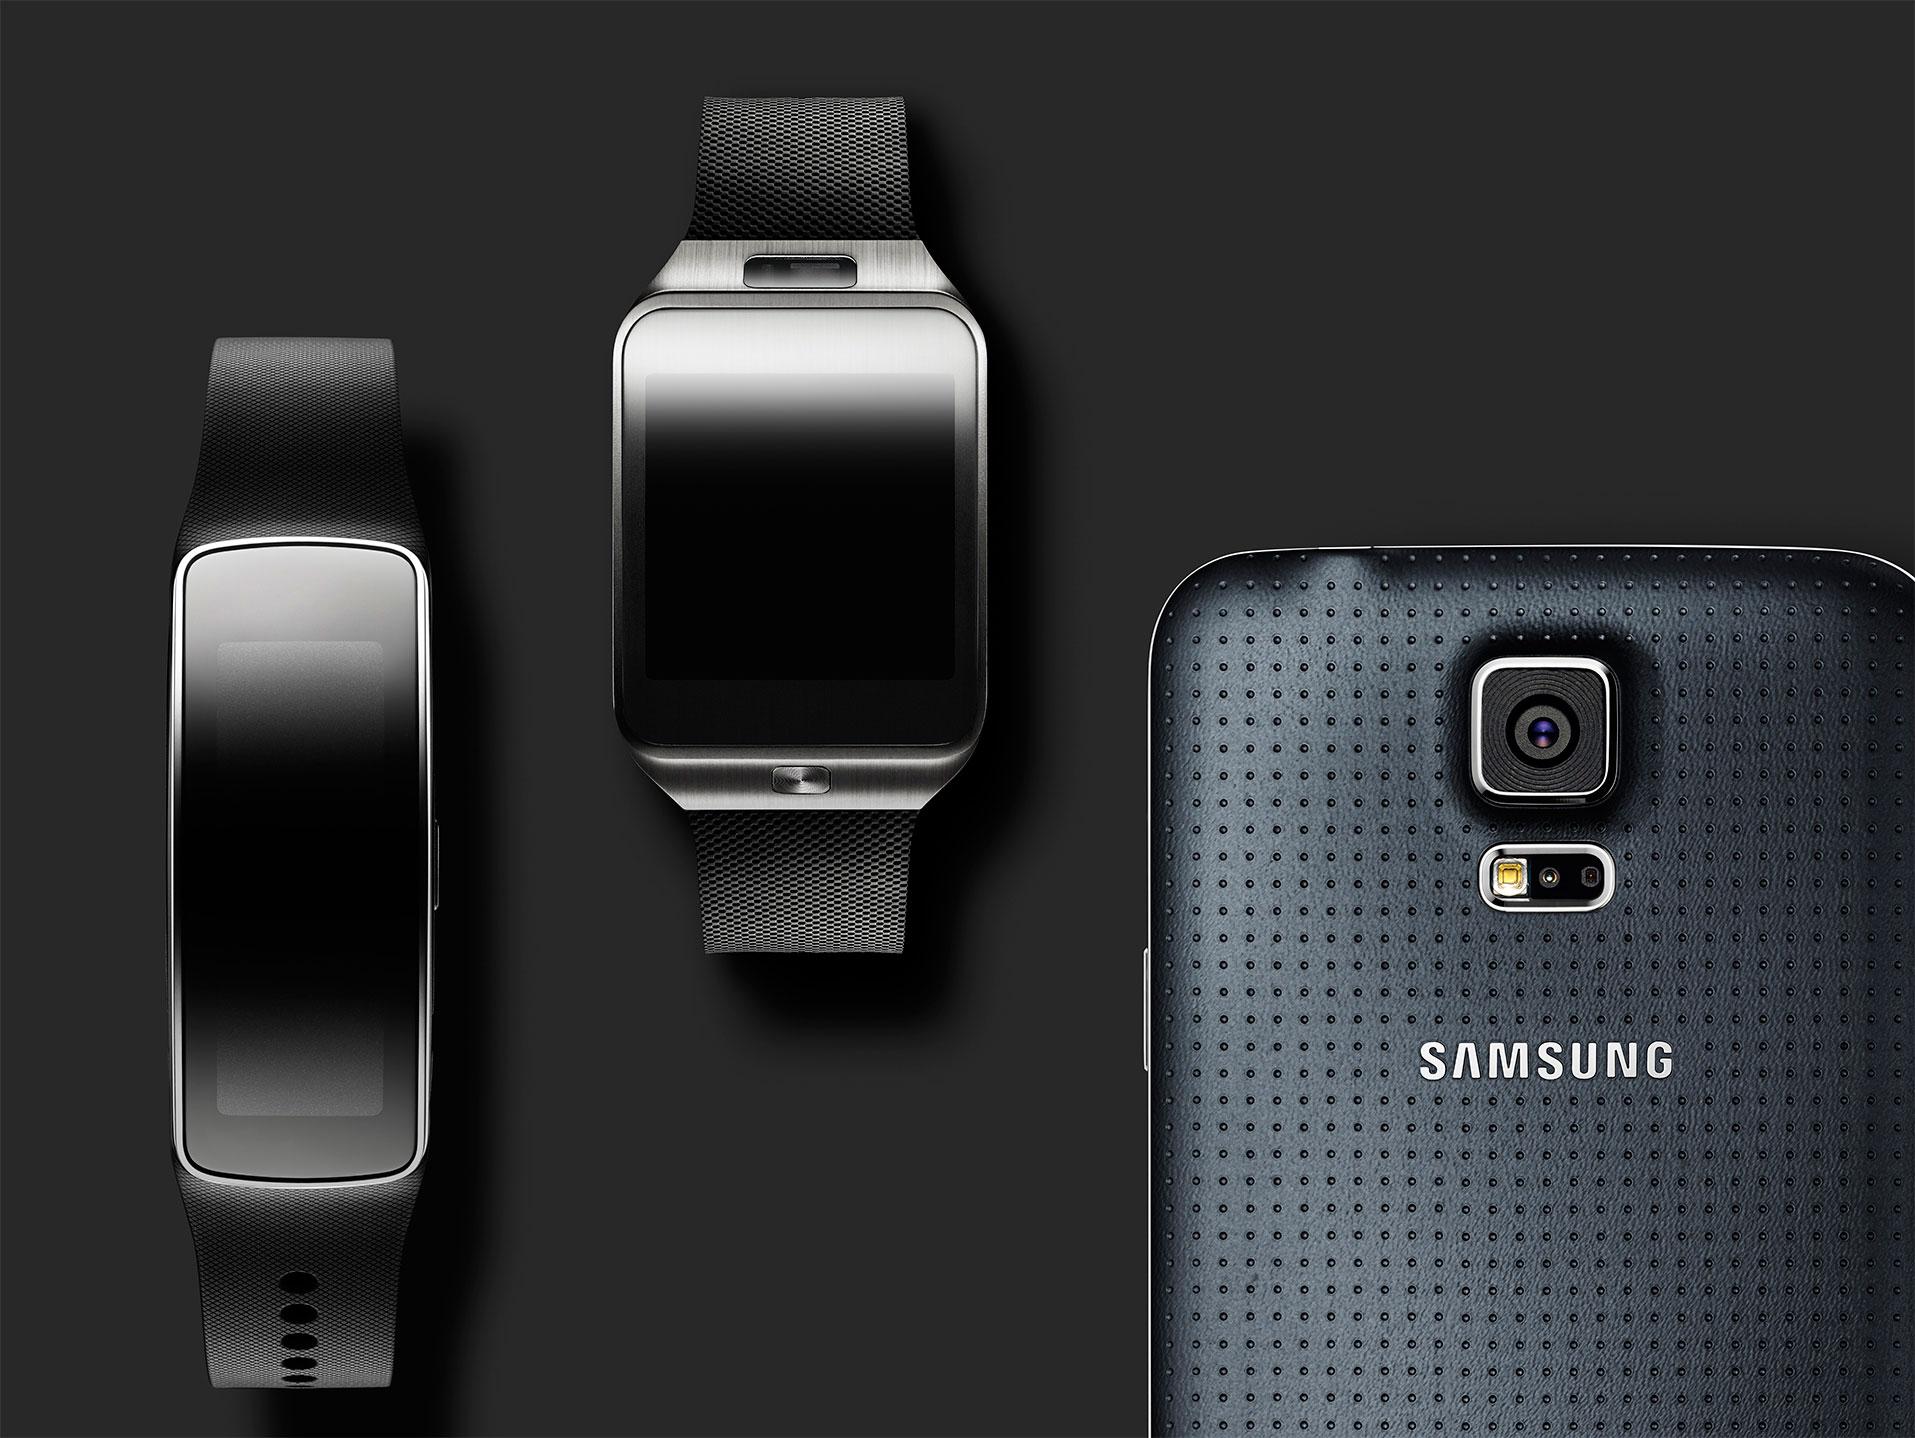 Novos produtos da Samsung